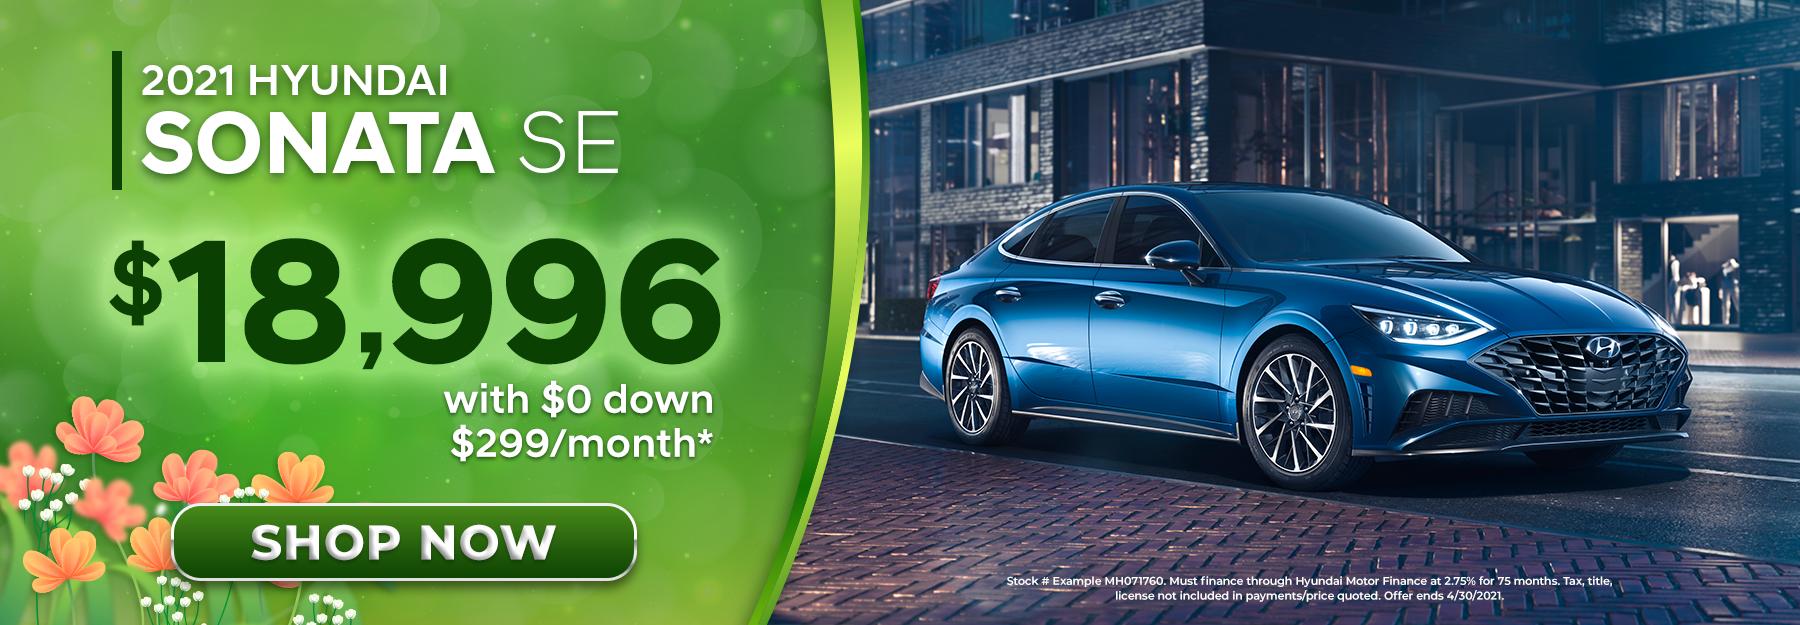 2021 Hyundai Sonata SE With $0 Down, $299/Month